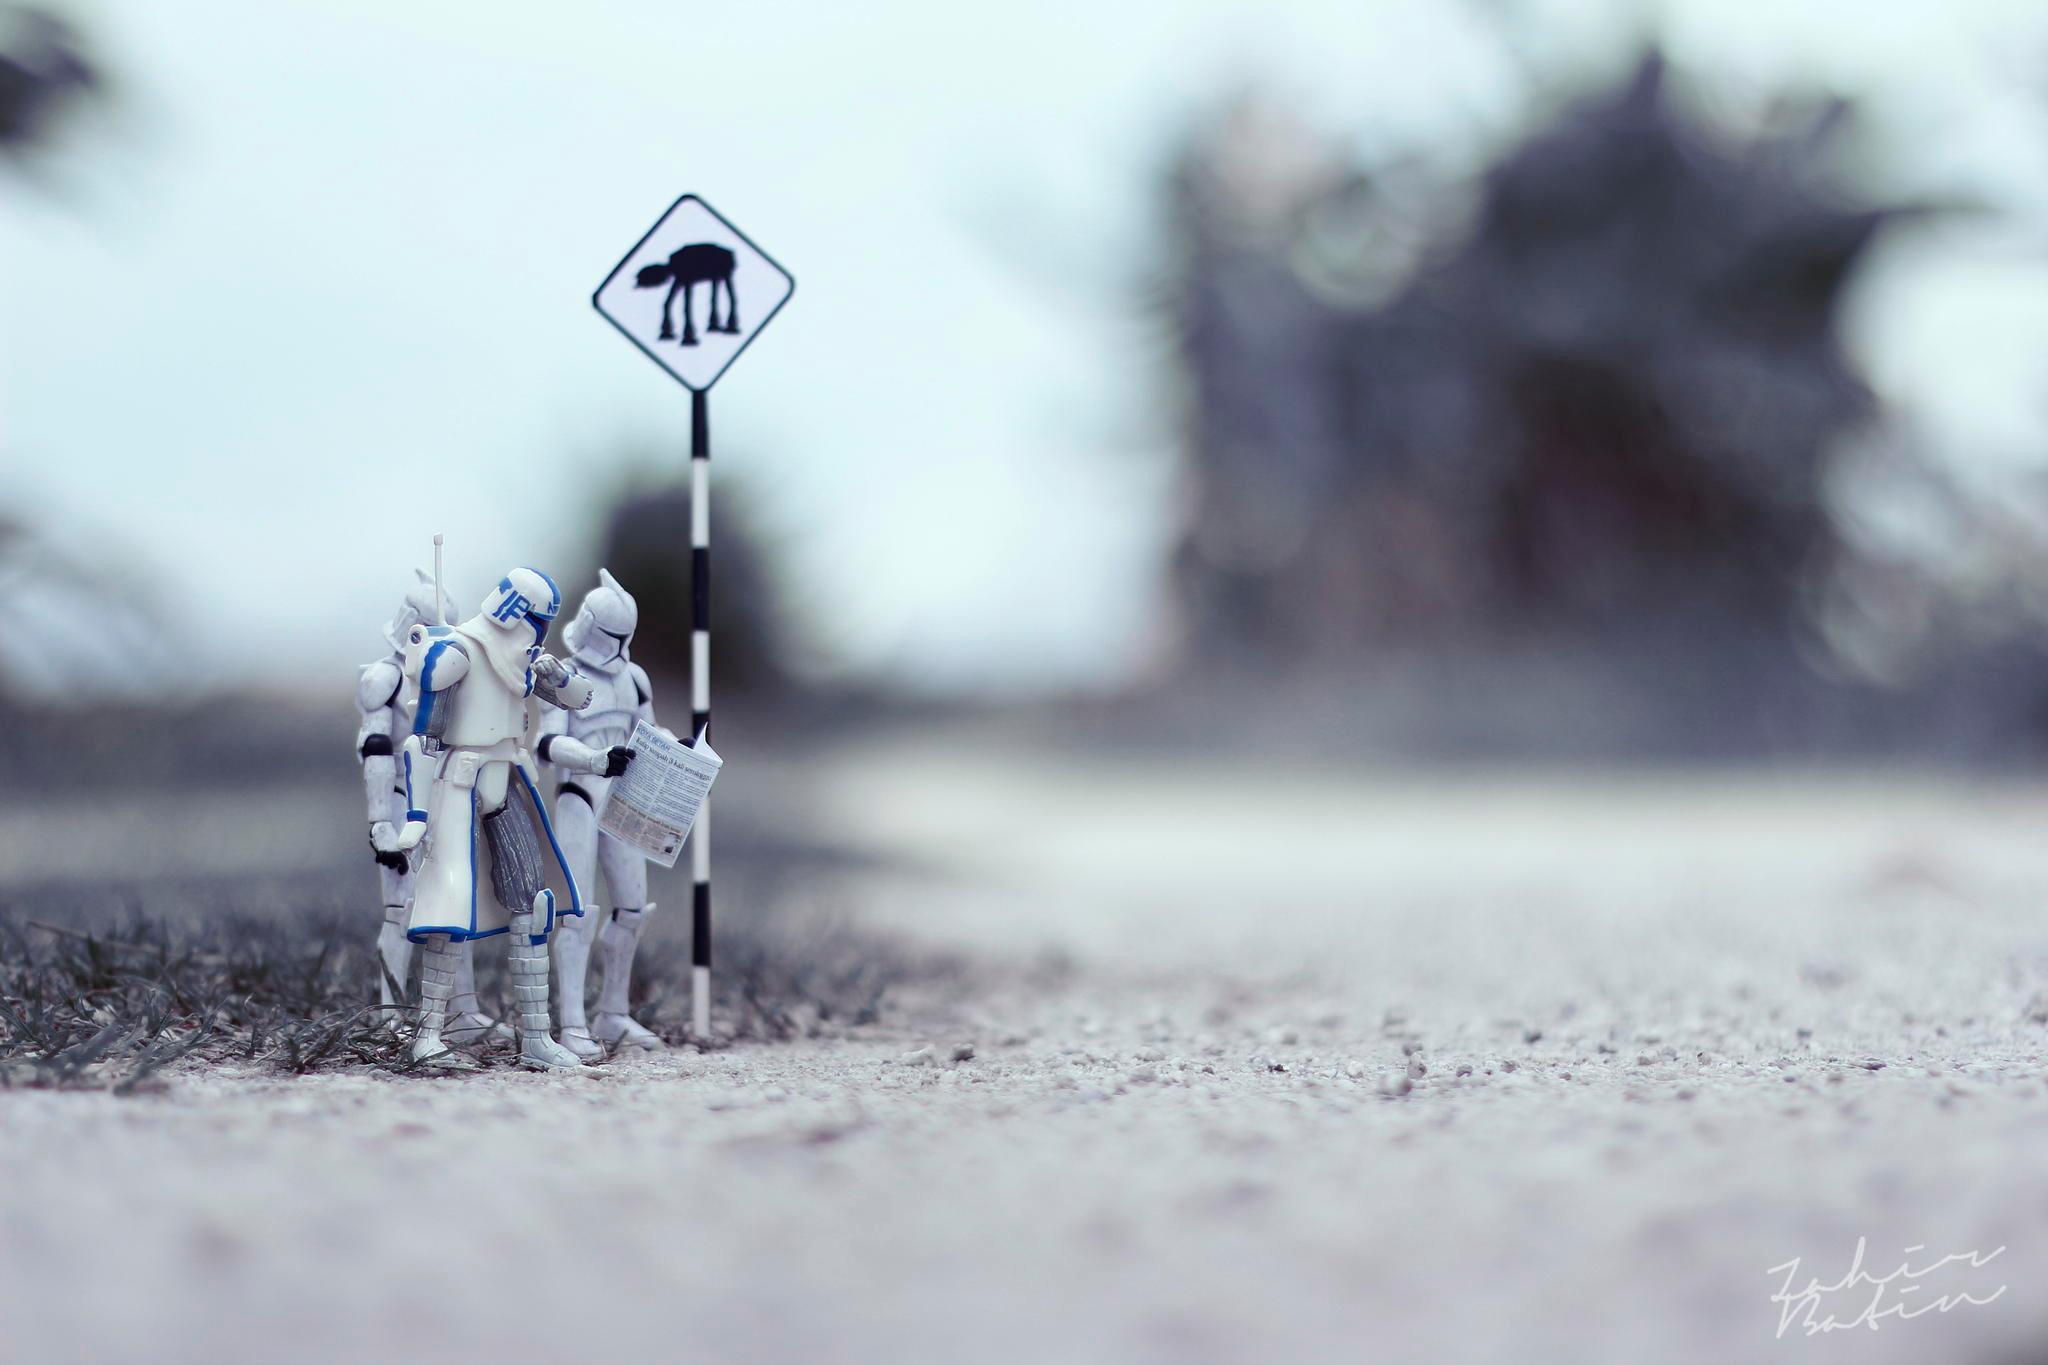 Dramatic And Amusing Macro Shots Of Star Wars Figurines